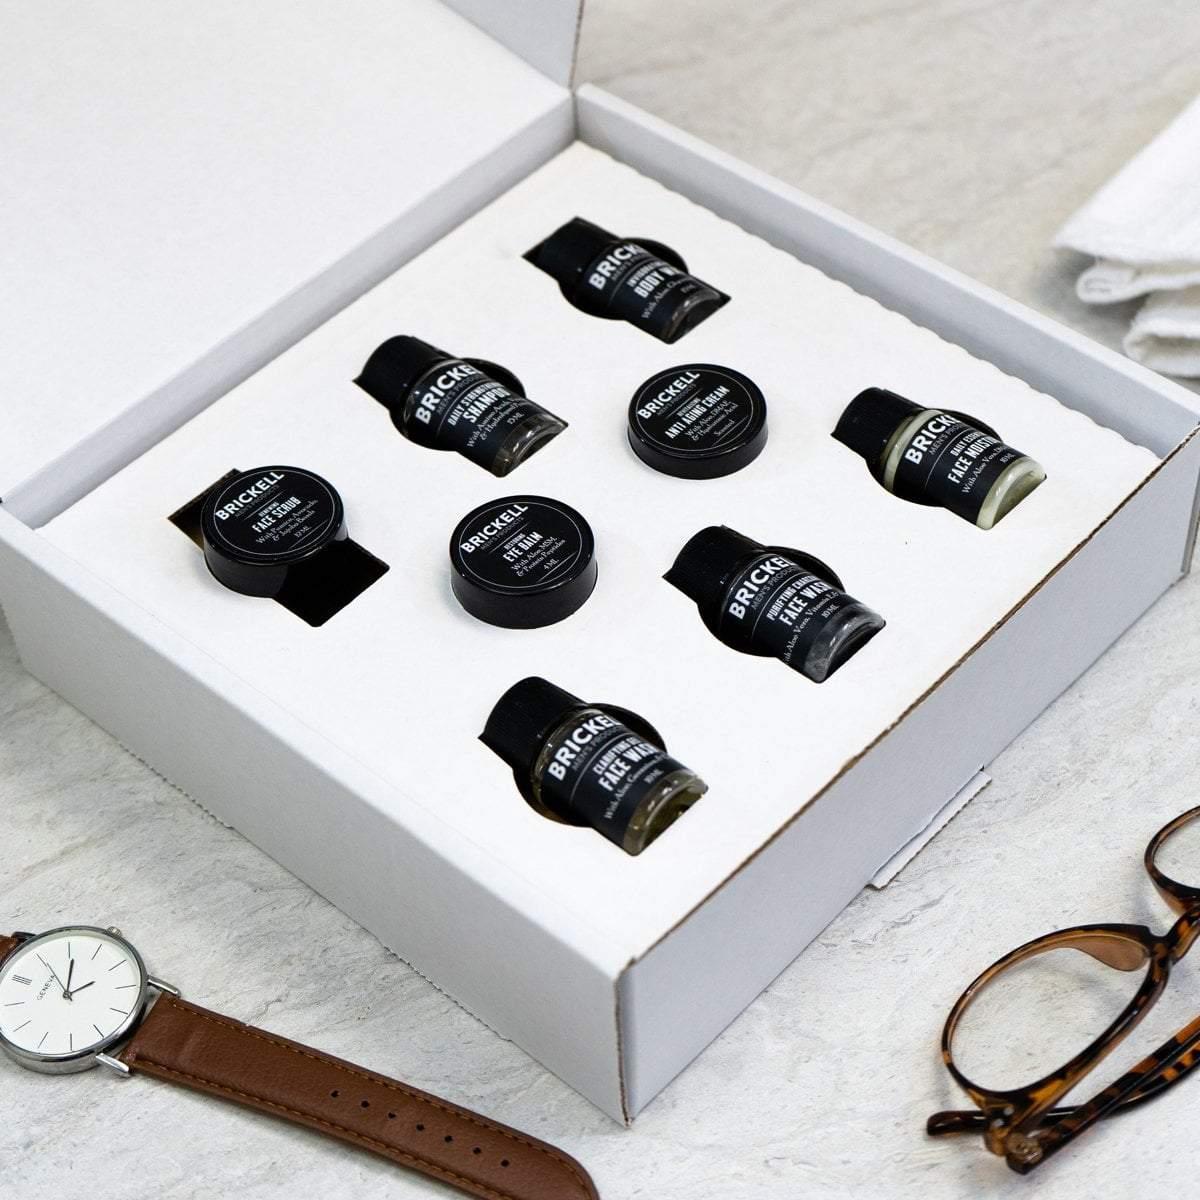 Brickell Men's Products Sample Kit